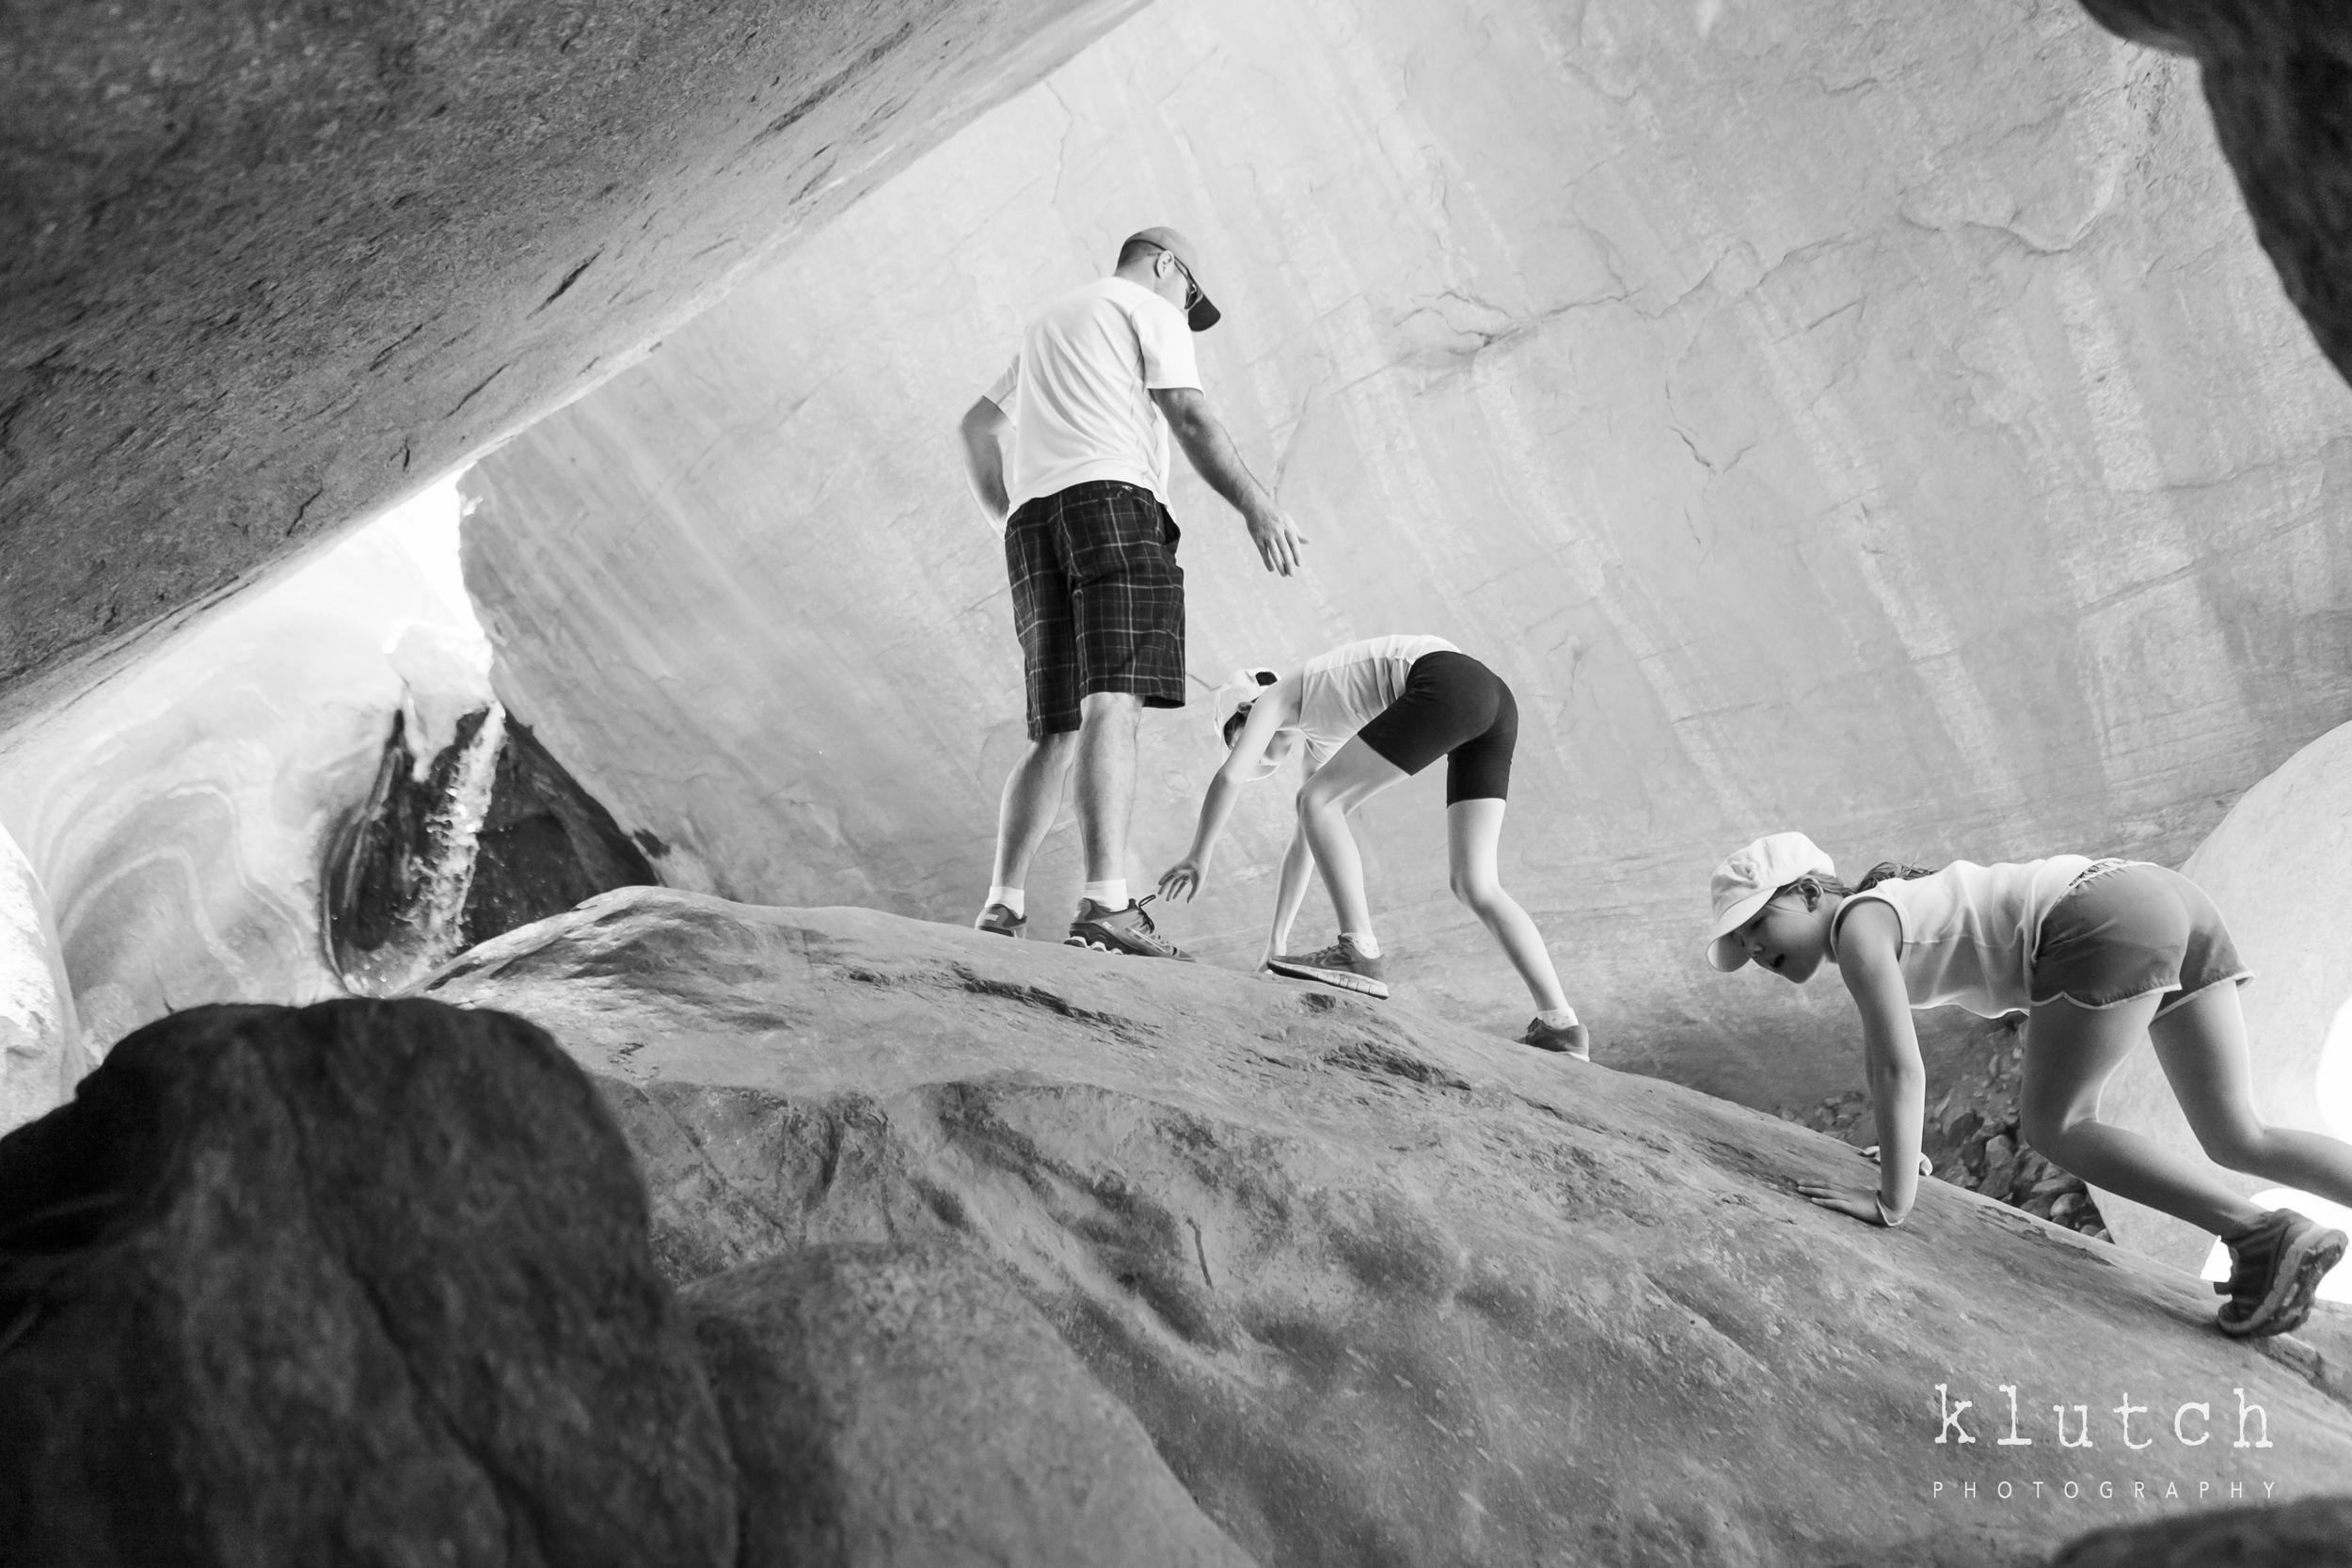 Klutch Photography,white rock family photographer, vancouver family photographer, whiterock lifestyle photographer, life unscripted photographer, life unscripted session, photography,Dina Ferreira Stoddard-21.jpg